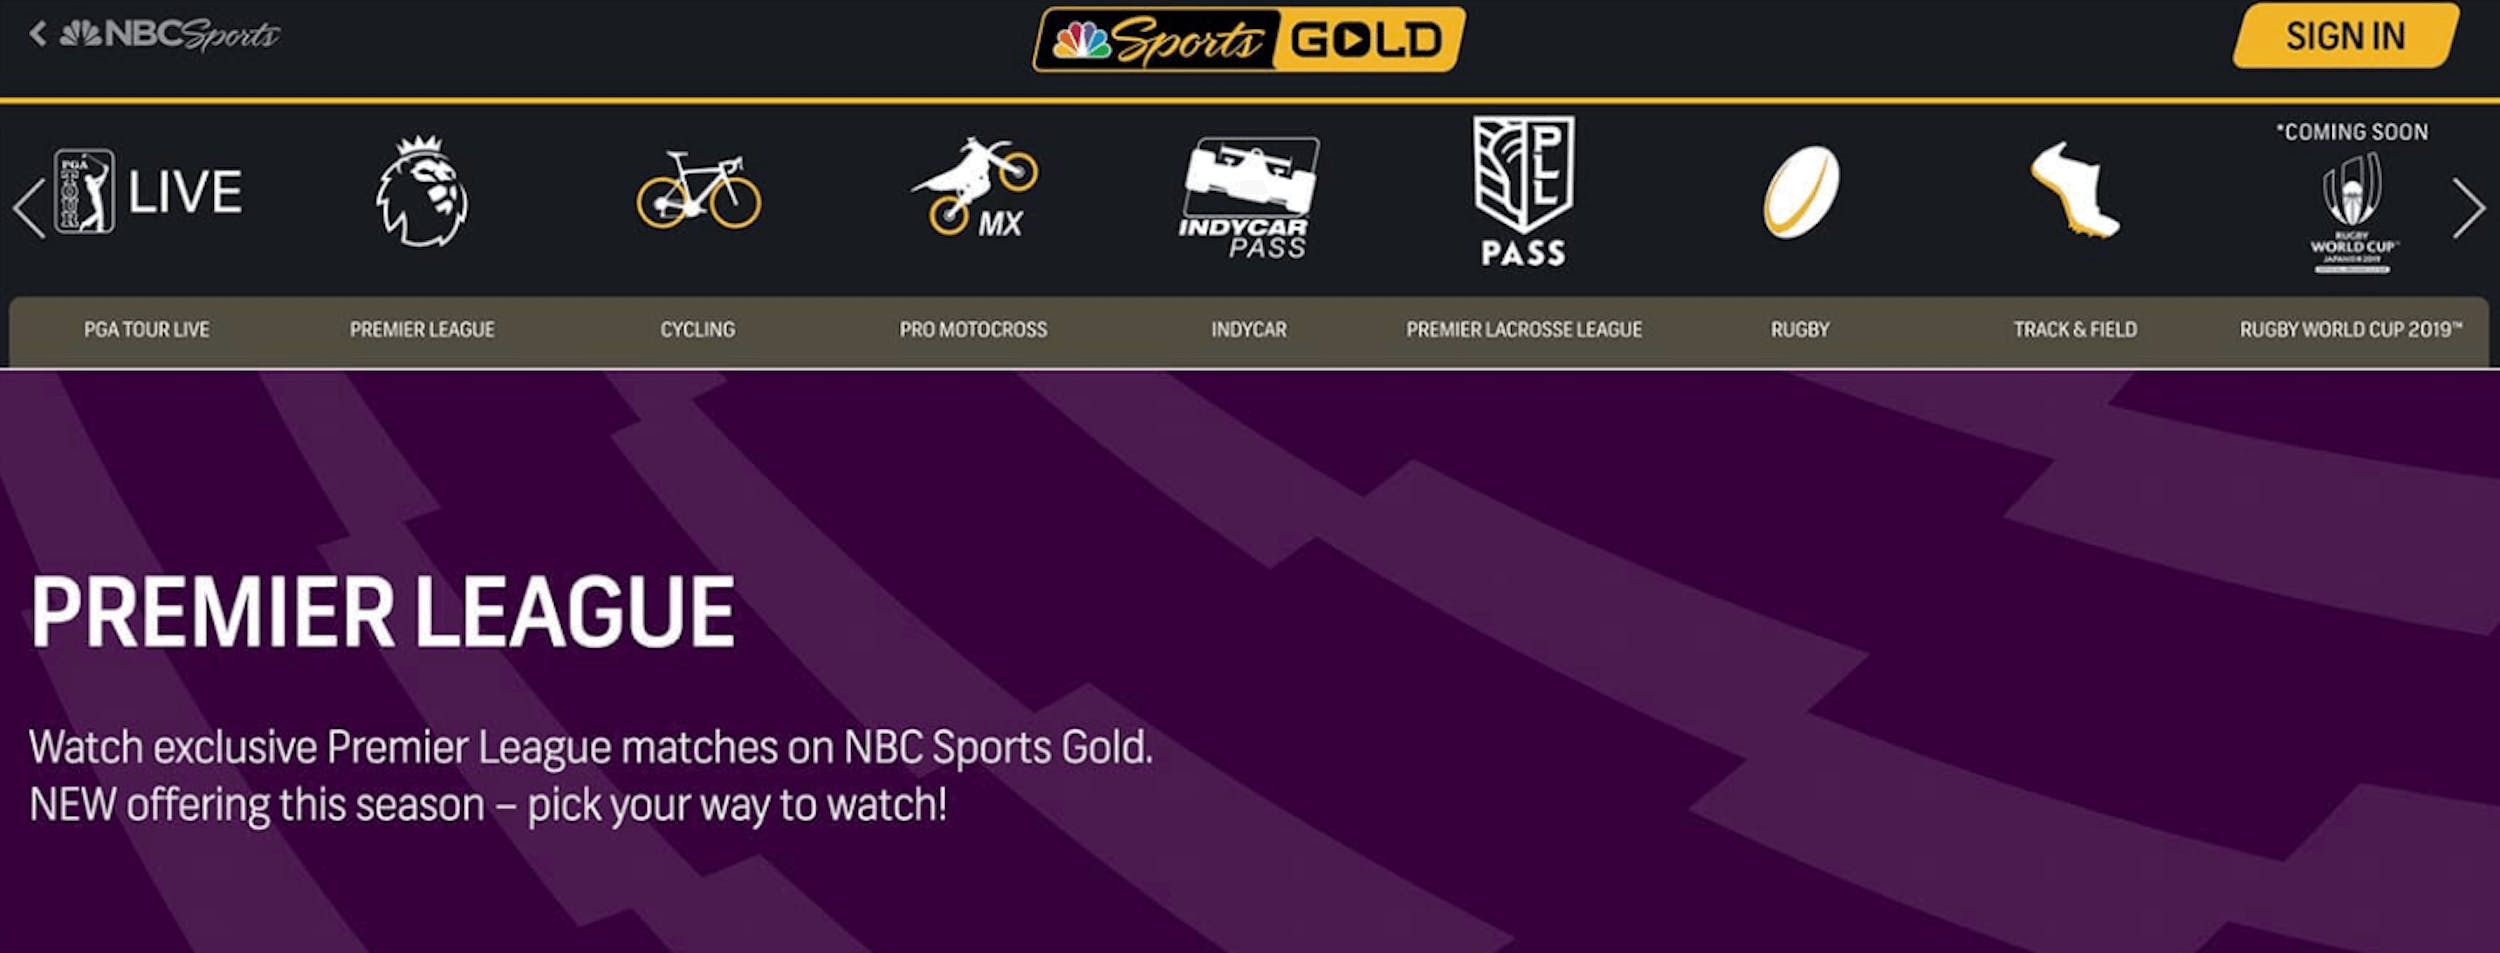 chelsea vs aston villa live stream nbc sports gold